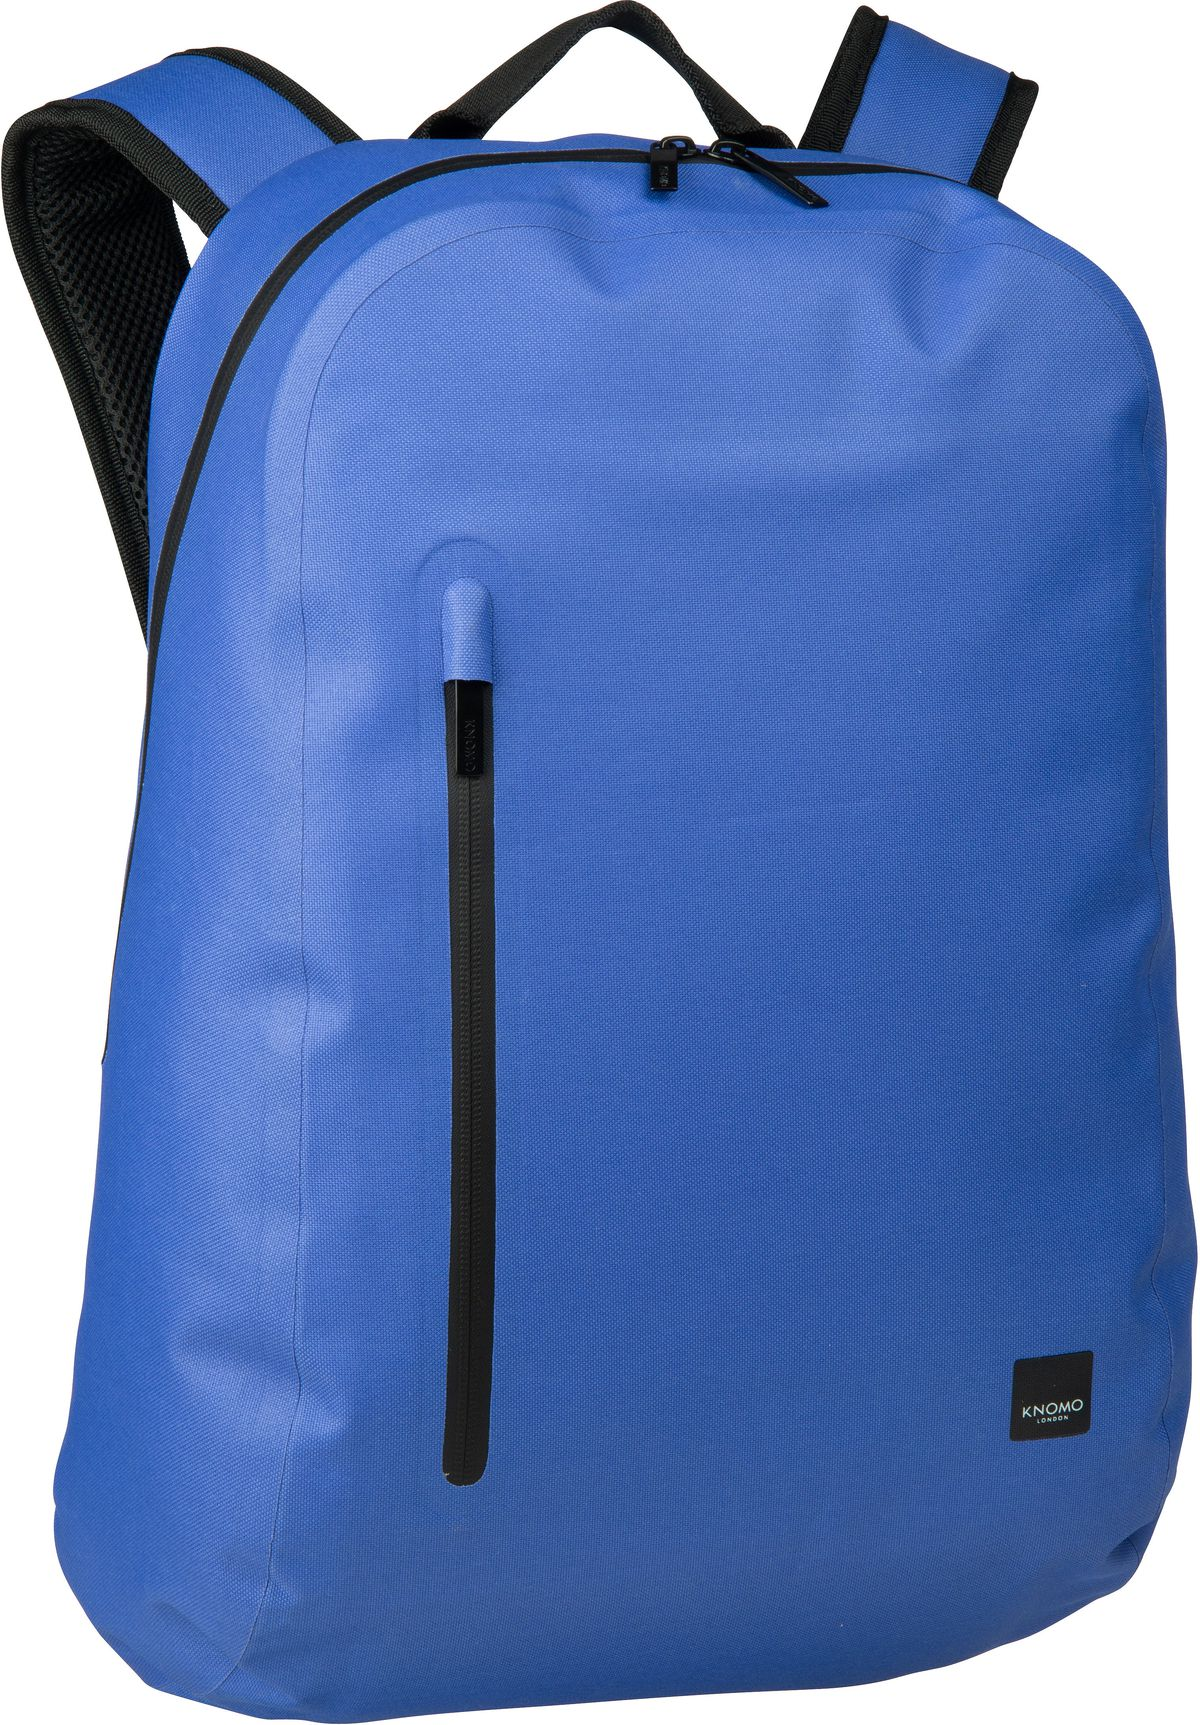 Laptoprucksack Thames Harpsden 14'' Azure Blue (20.3 Liter)